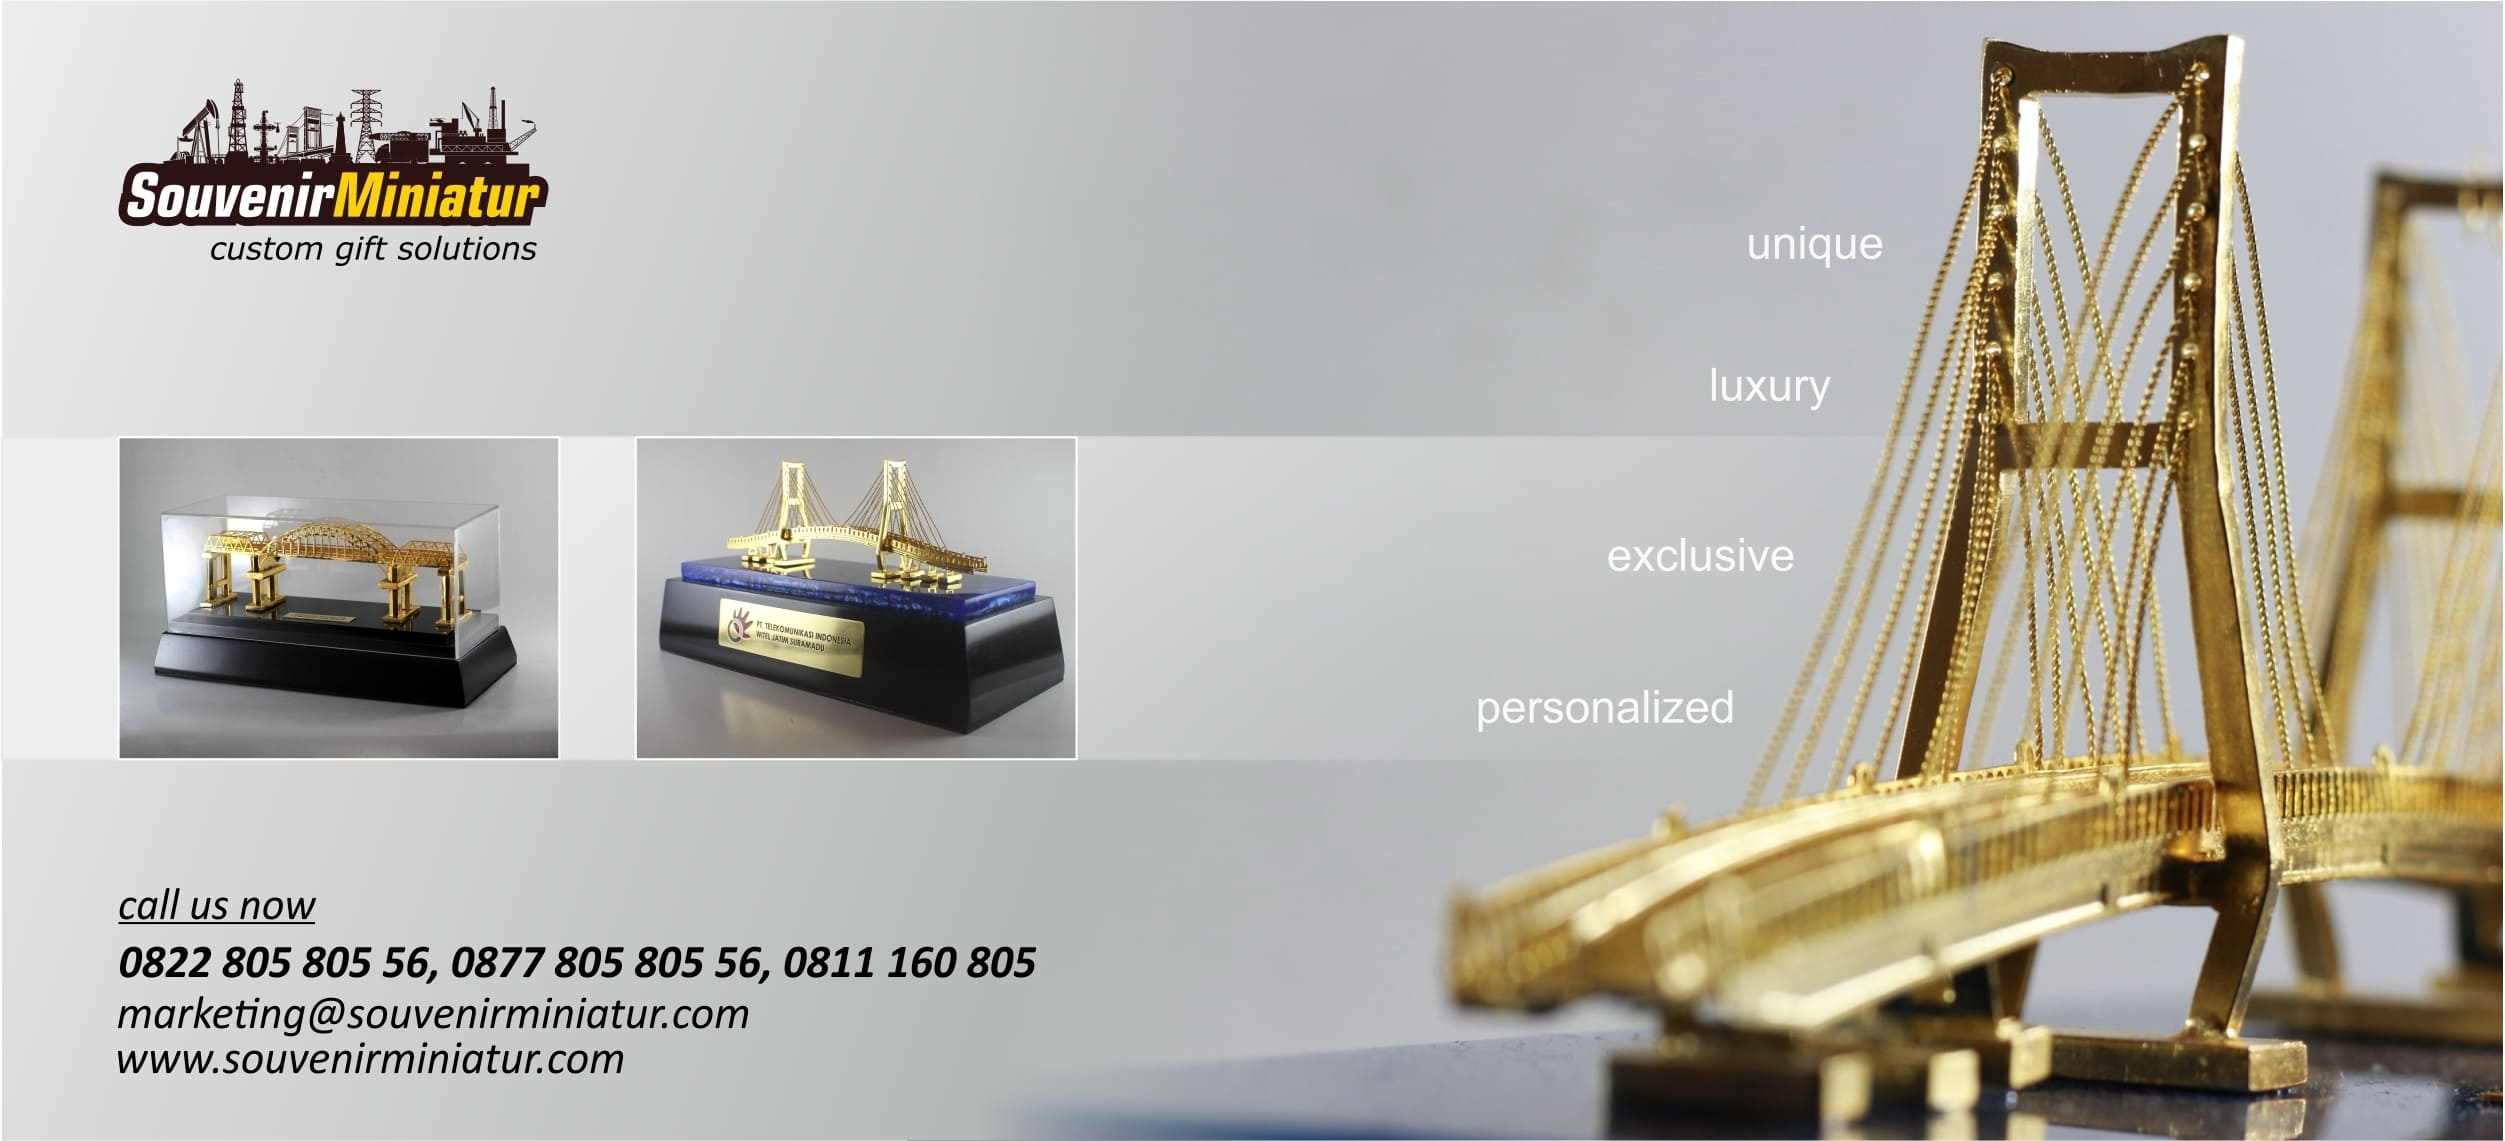 souvenir miniatur berkualitas